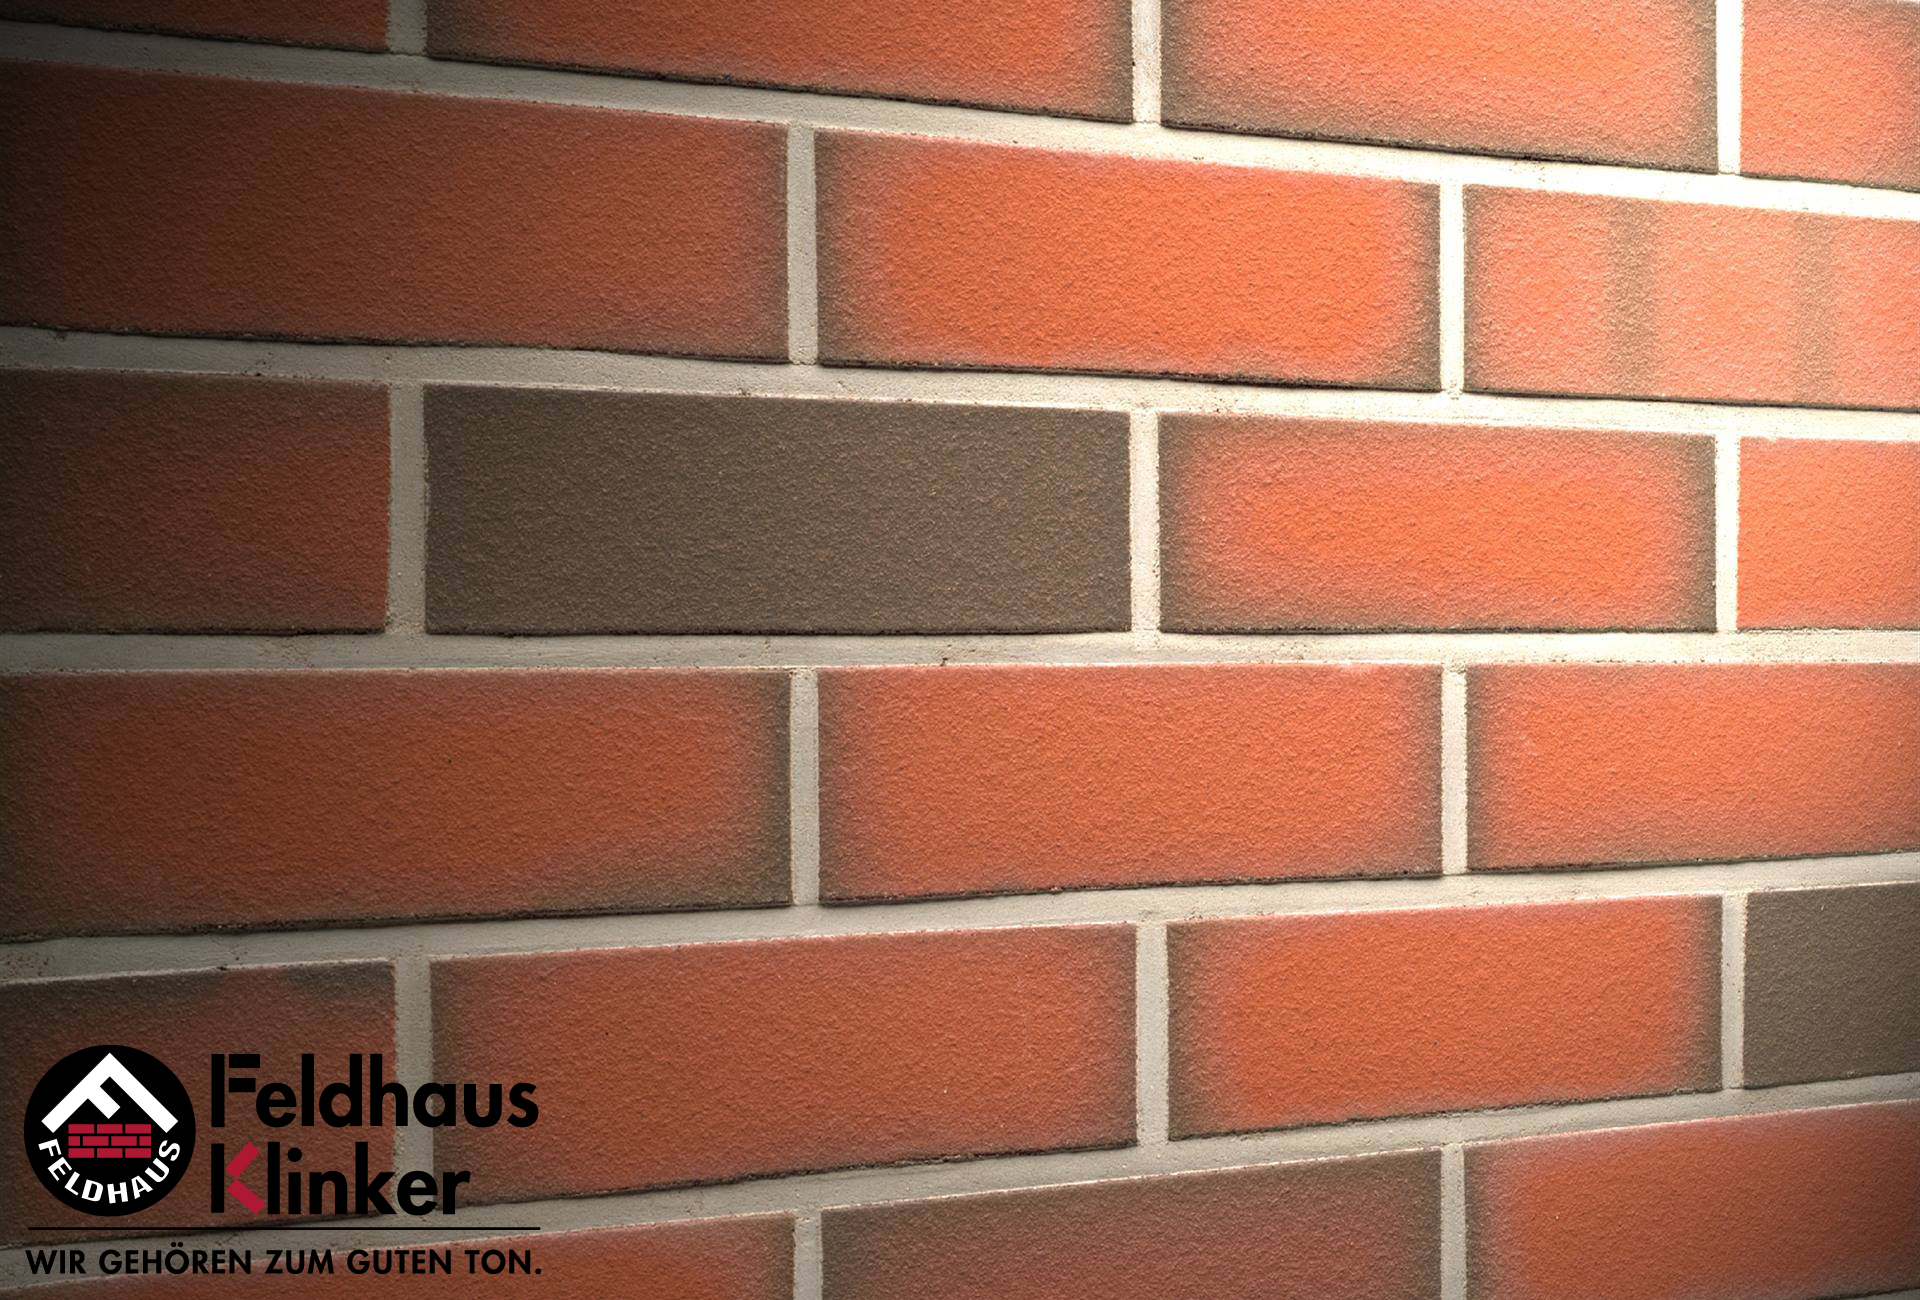 R303 Feldhaus Klinker клинкерная плитка 1